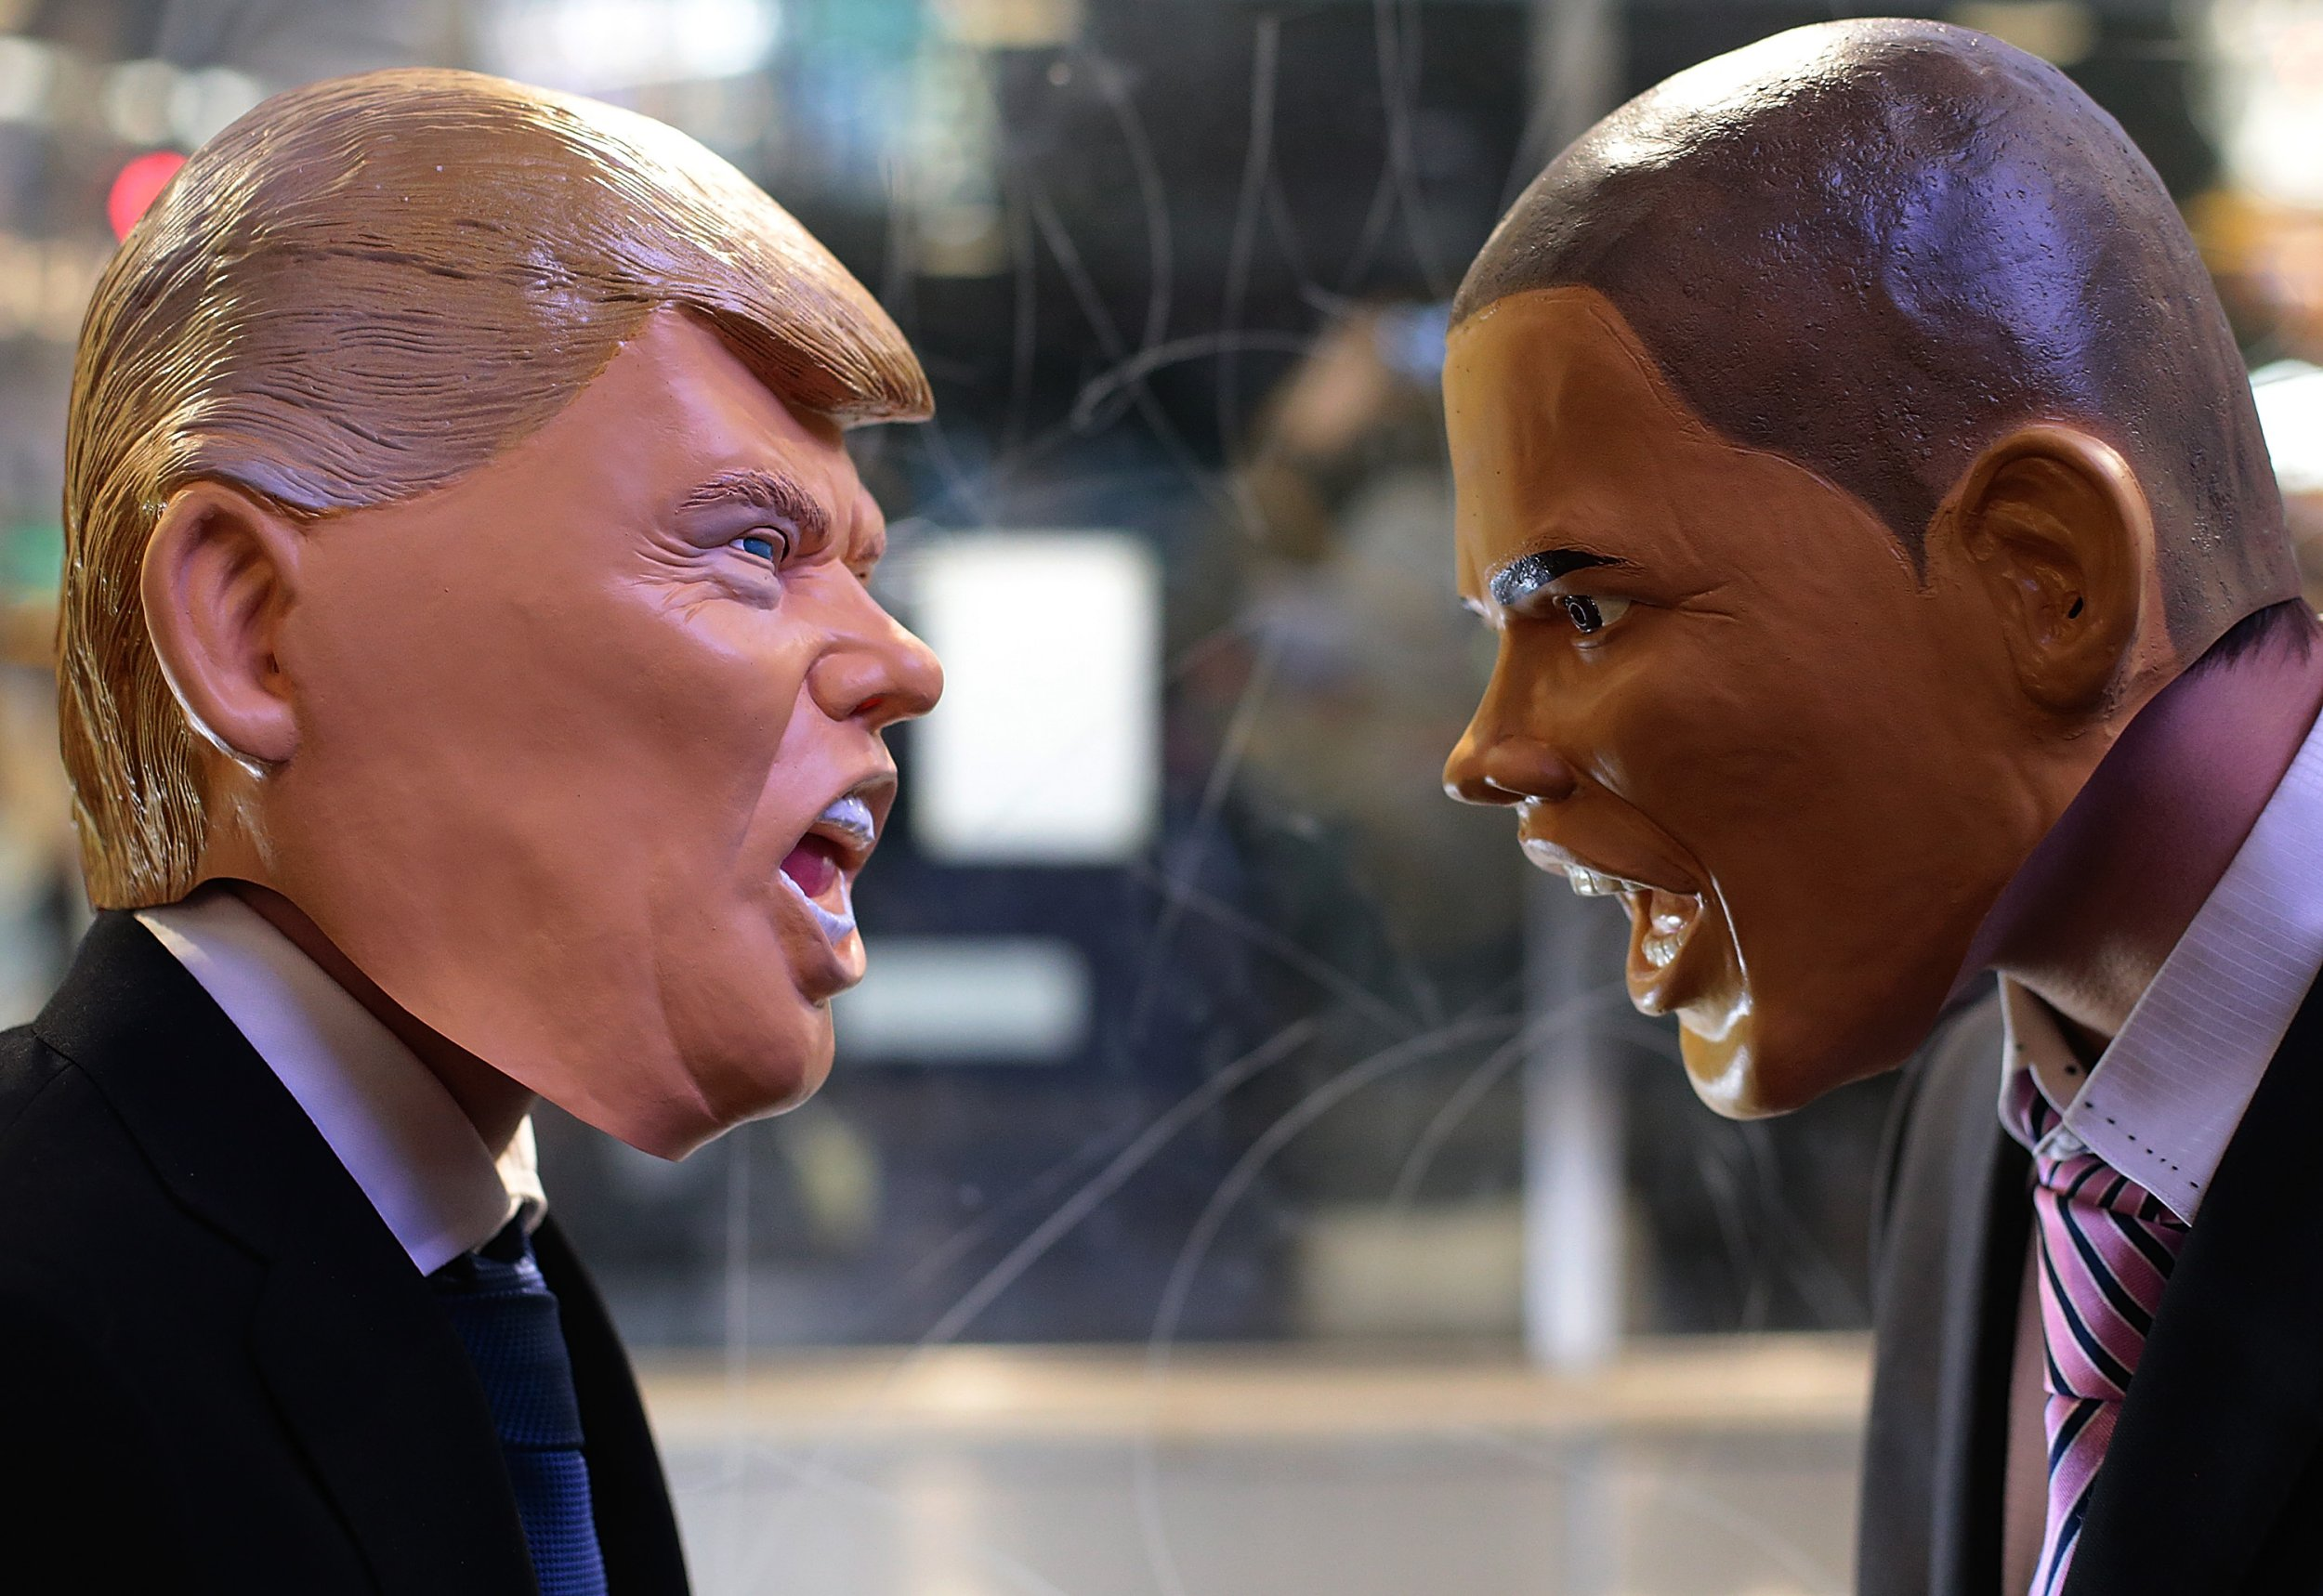 Donald Trump and Barack Obama set for awkward White House meeting